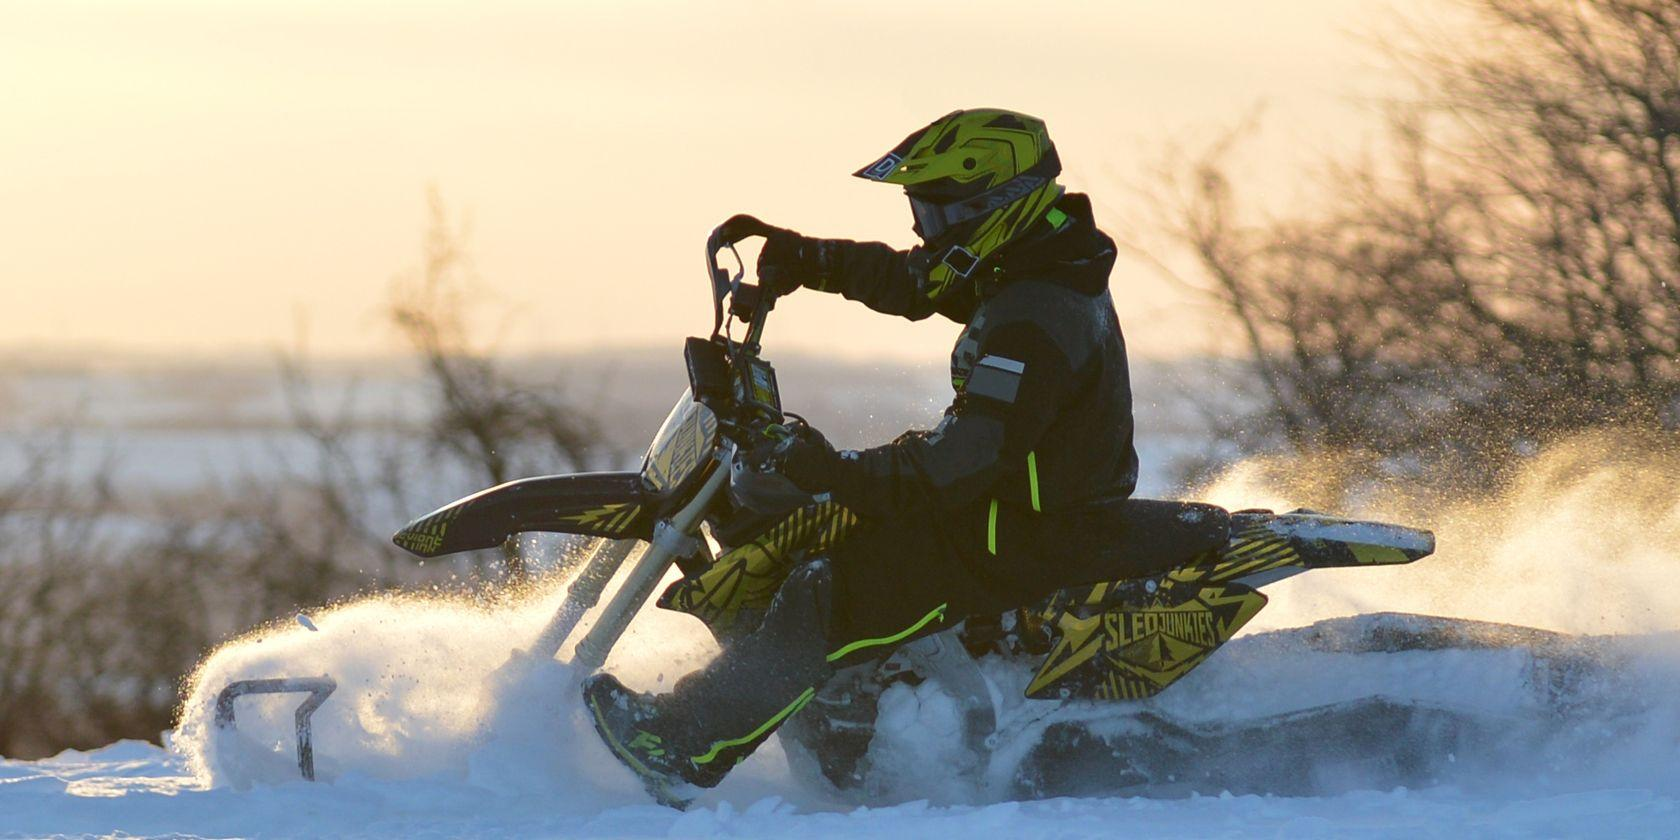 Moto DTS 129